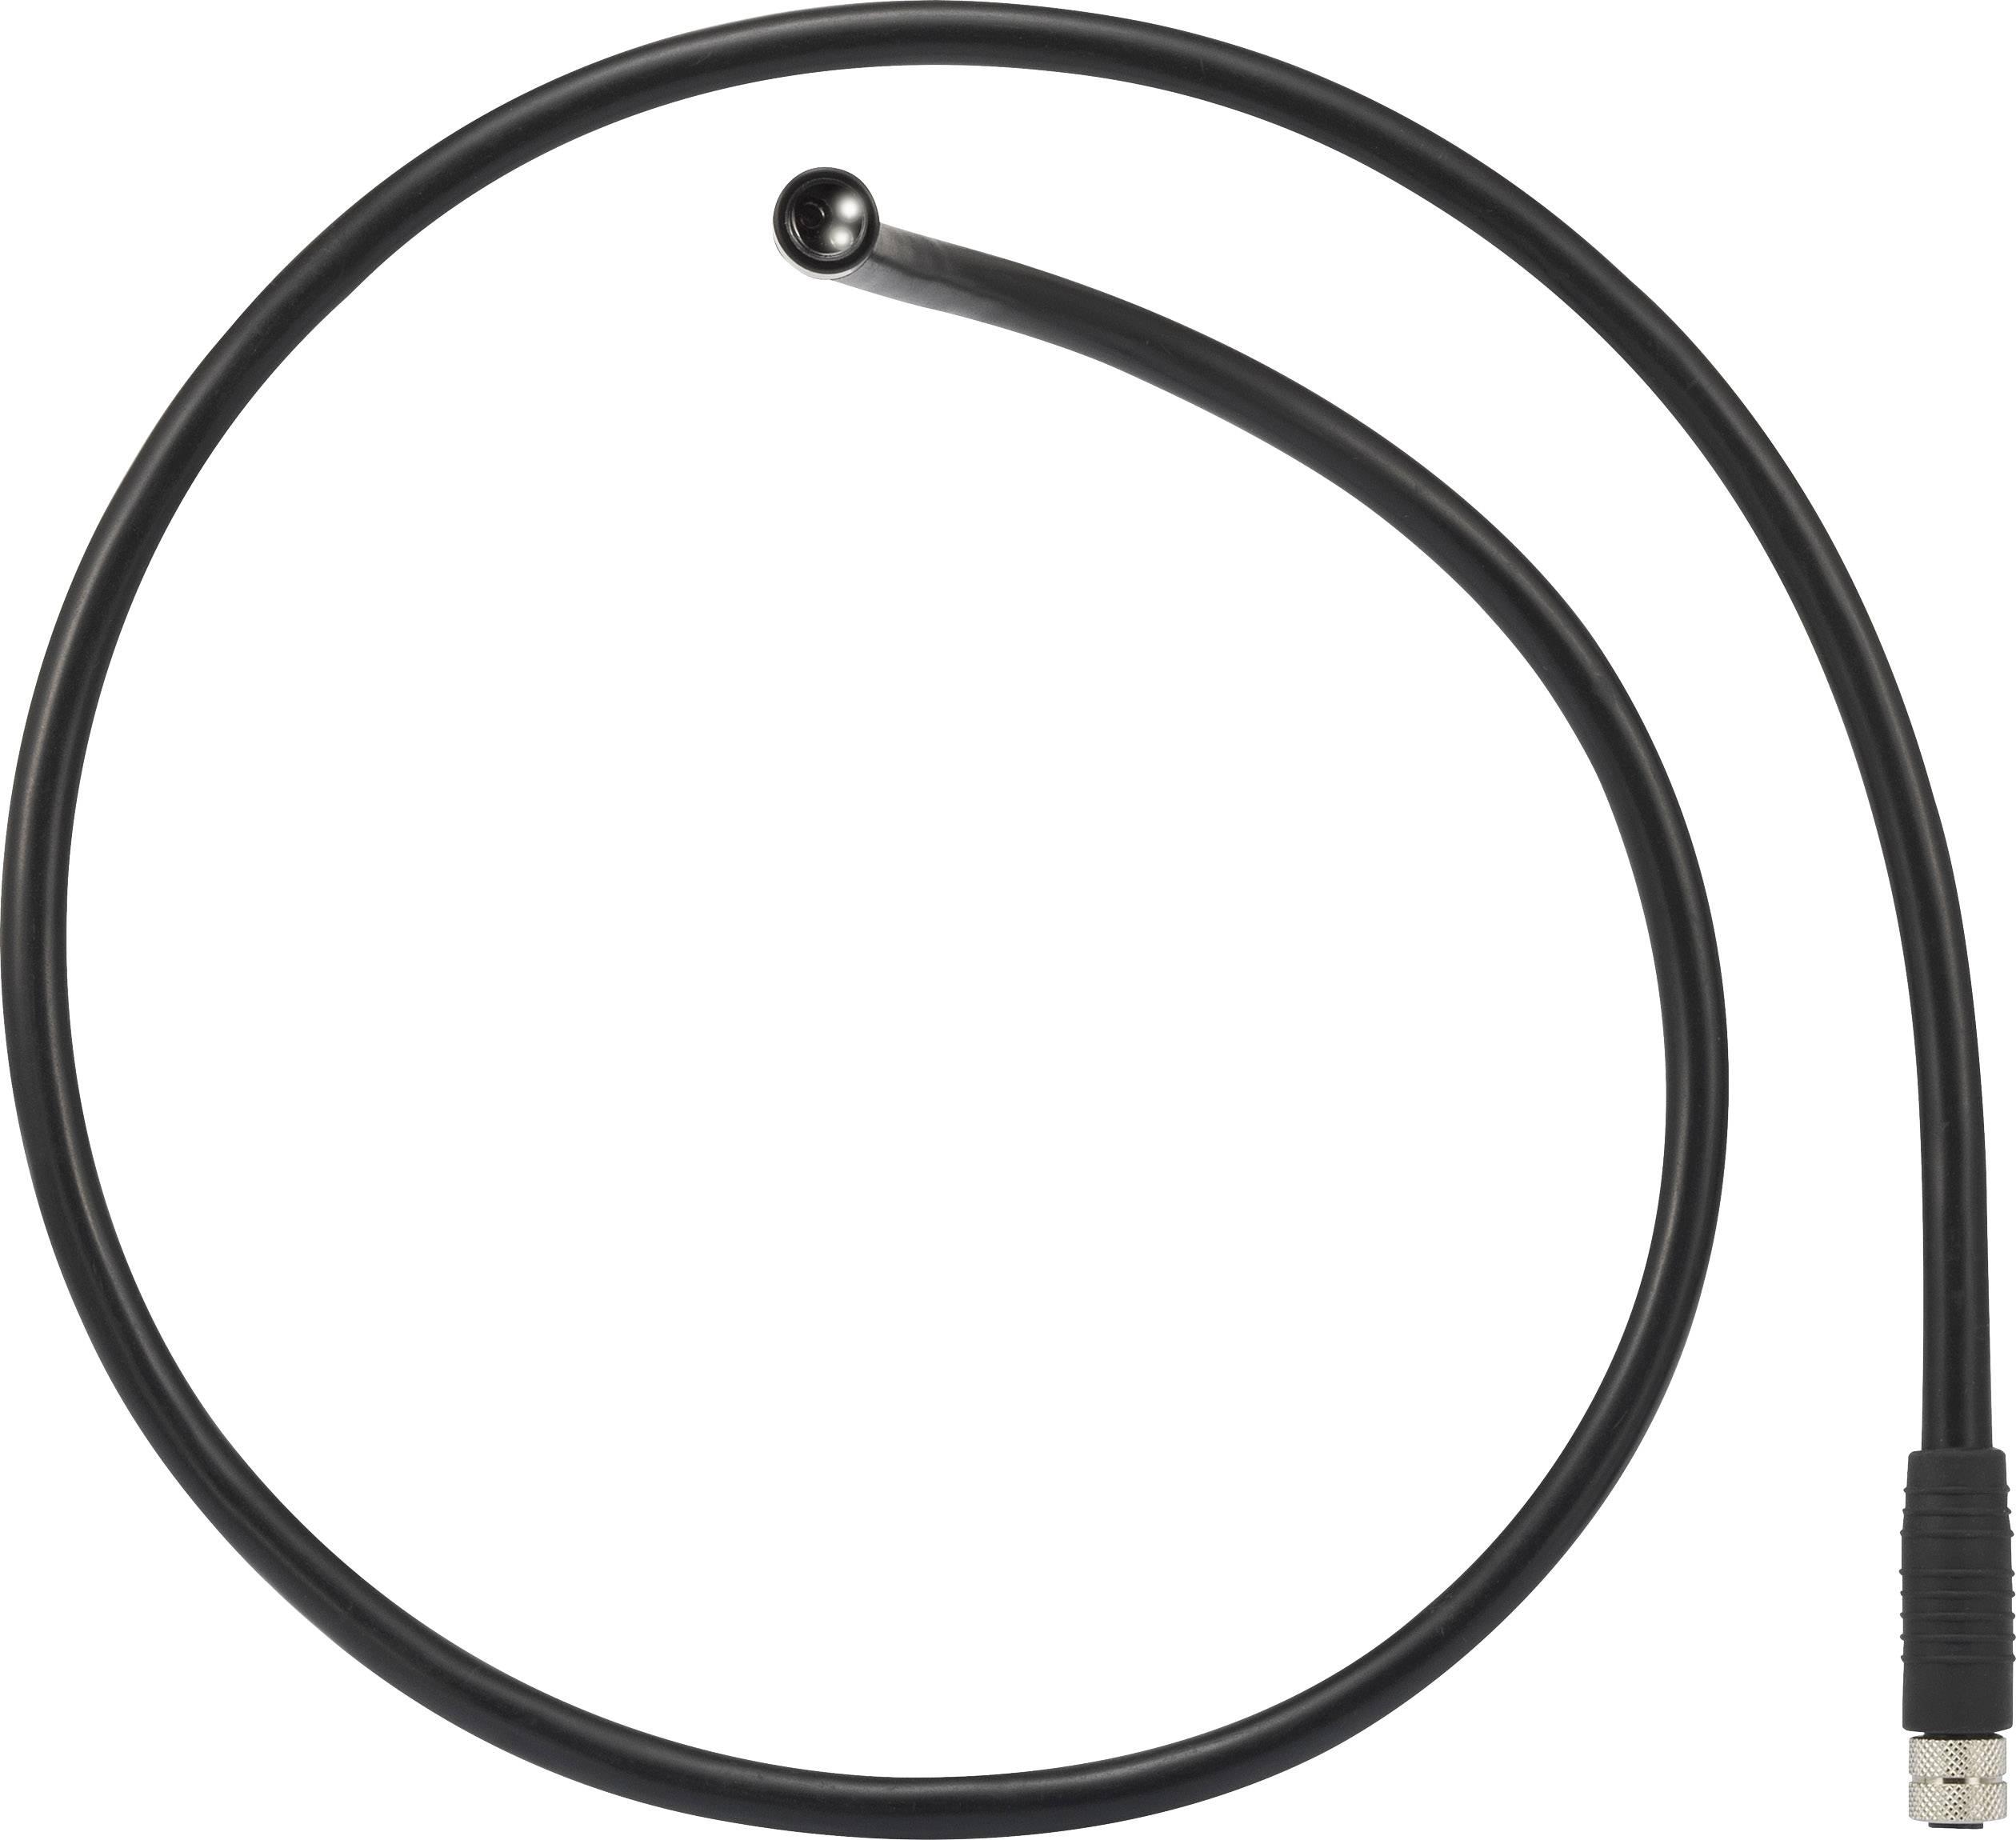 Sonda endoskopu VOLTCRAFT 1,2 m/14 mm Ø sondy 11 mm 120 cm